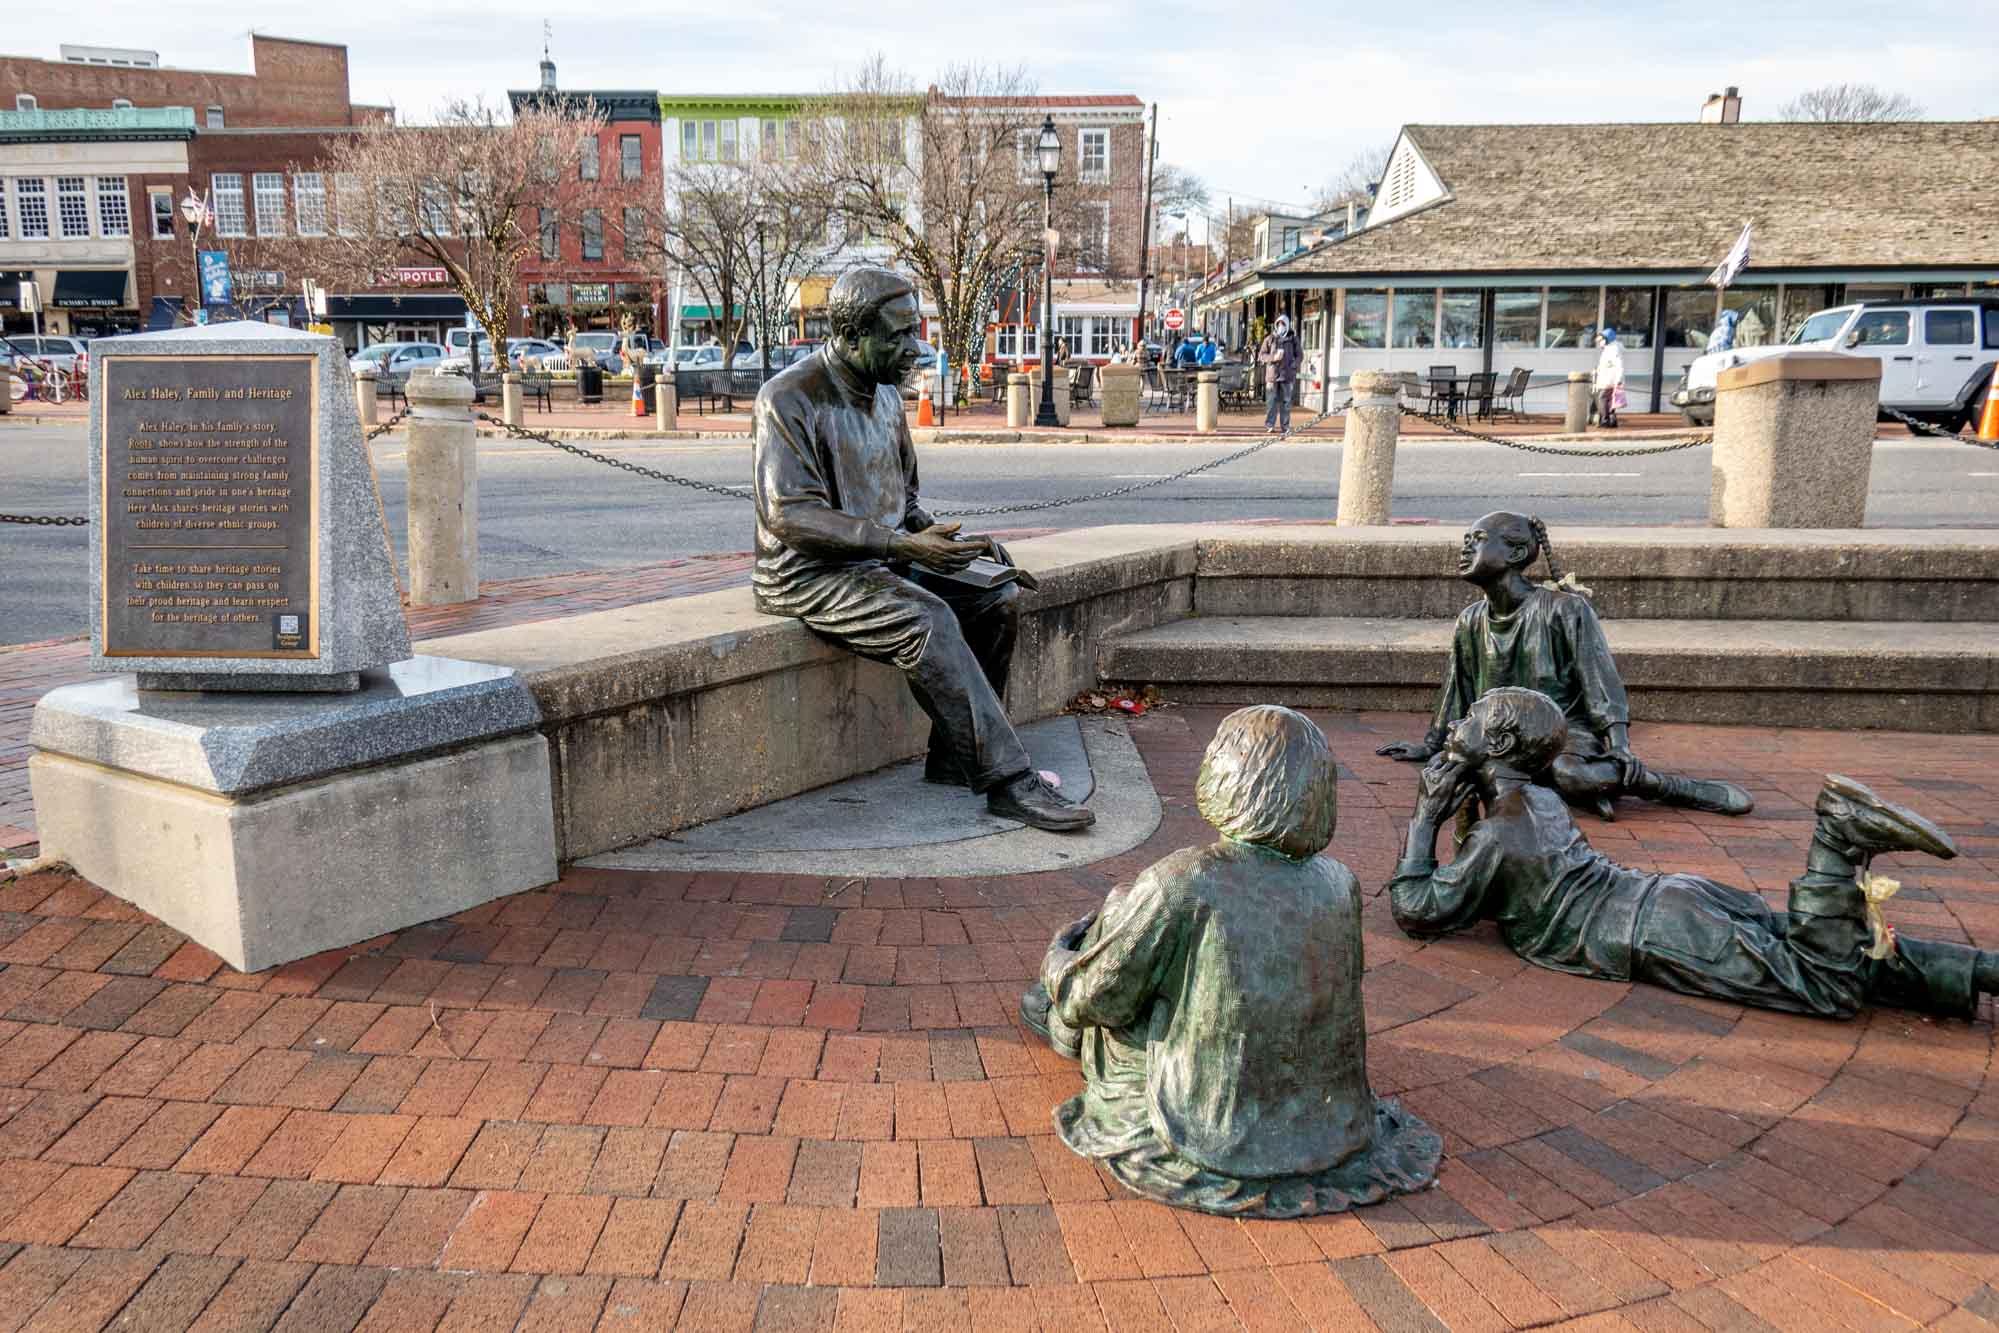 Sculpture of a man reading to three children